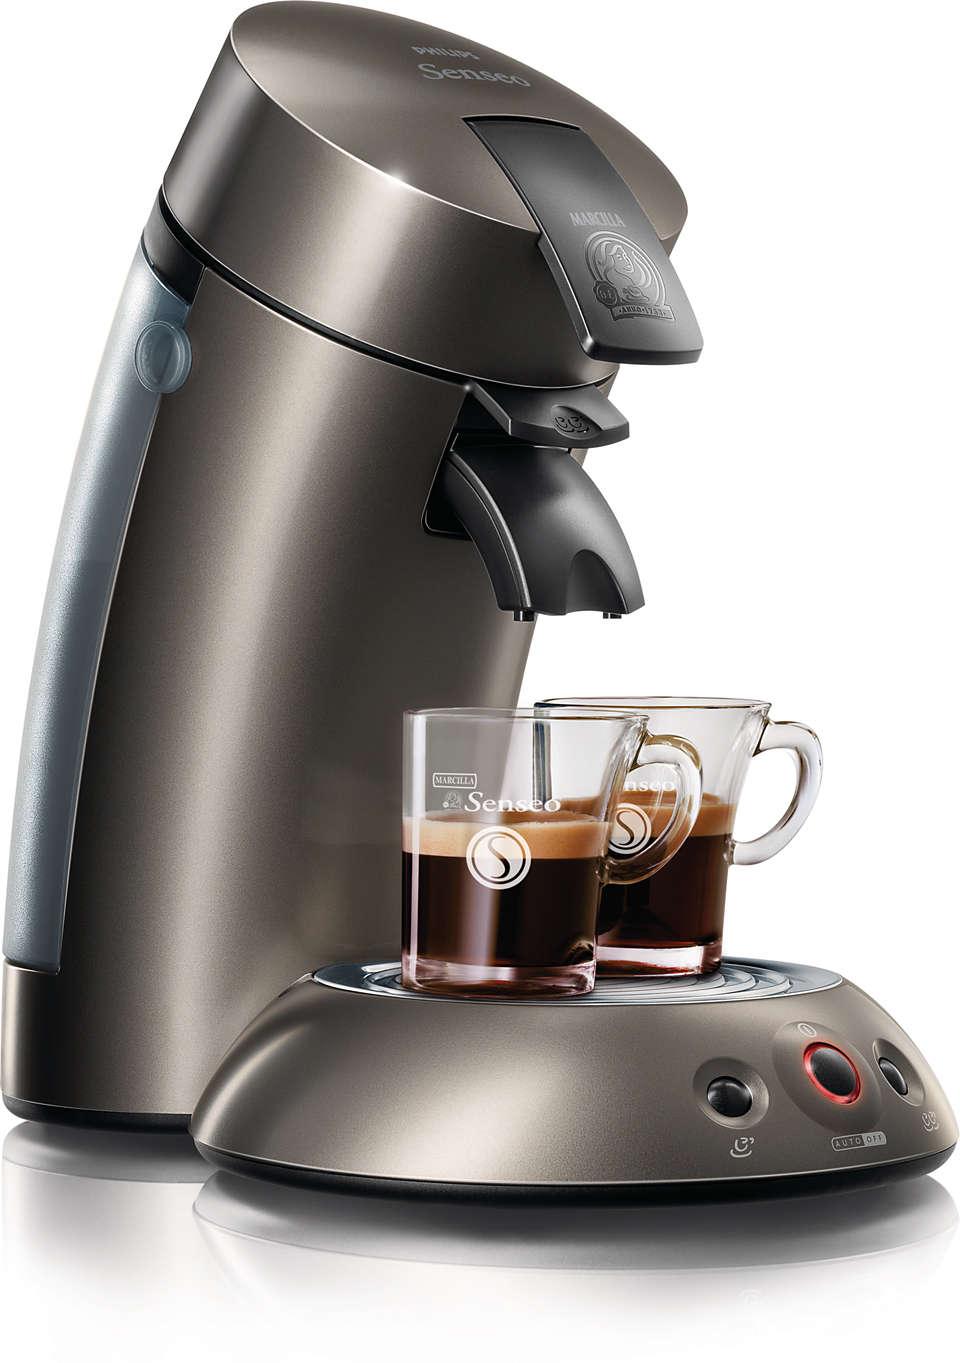 Simplemente disfruta de tu café